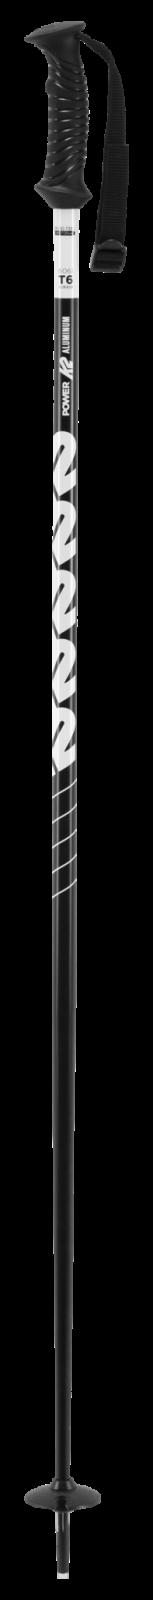 K2 Power Aluminum Ski Poles 2020